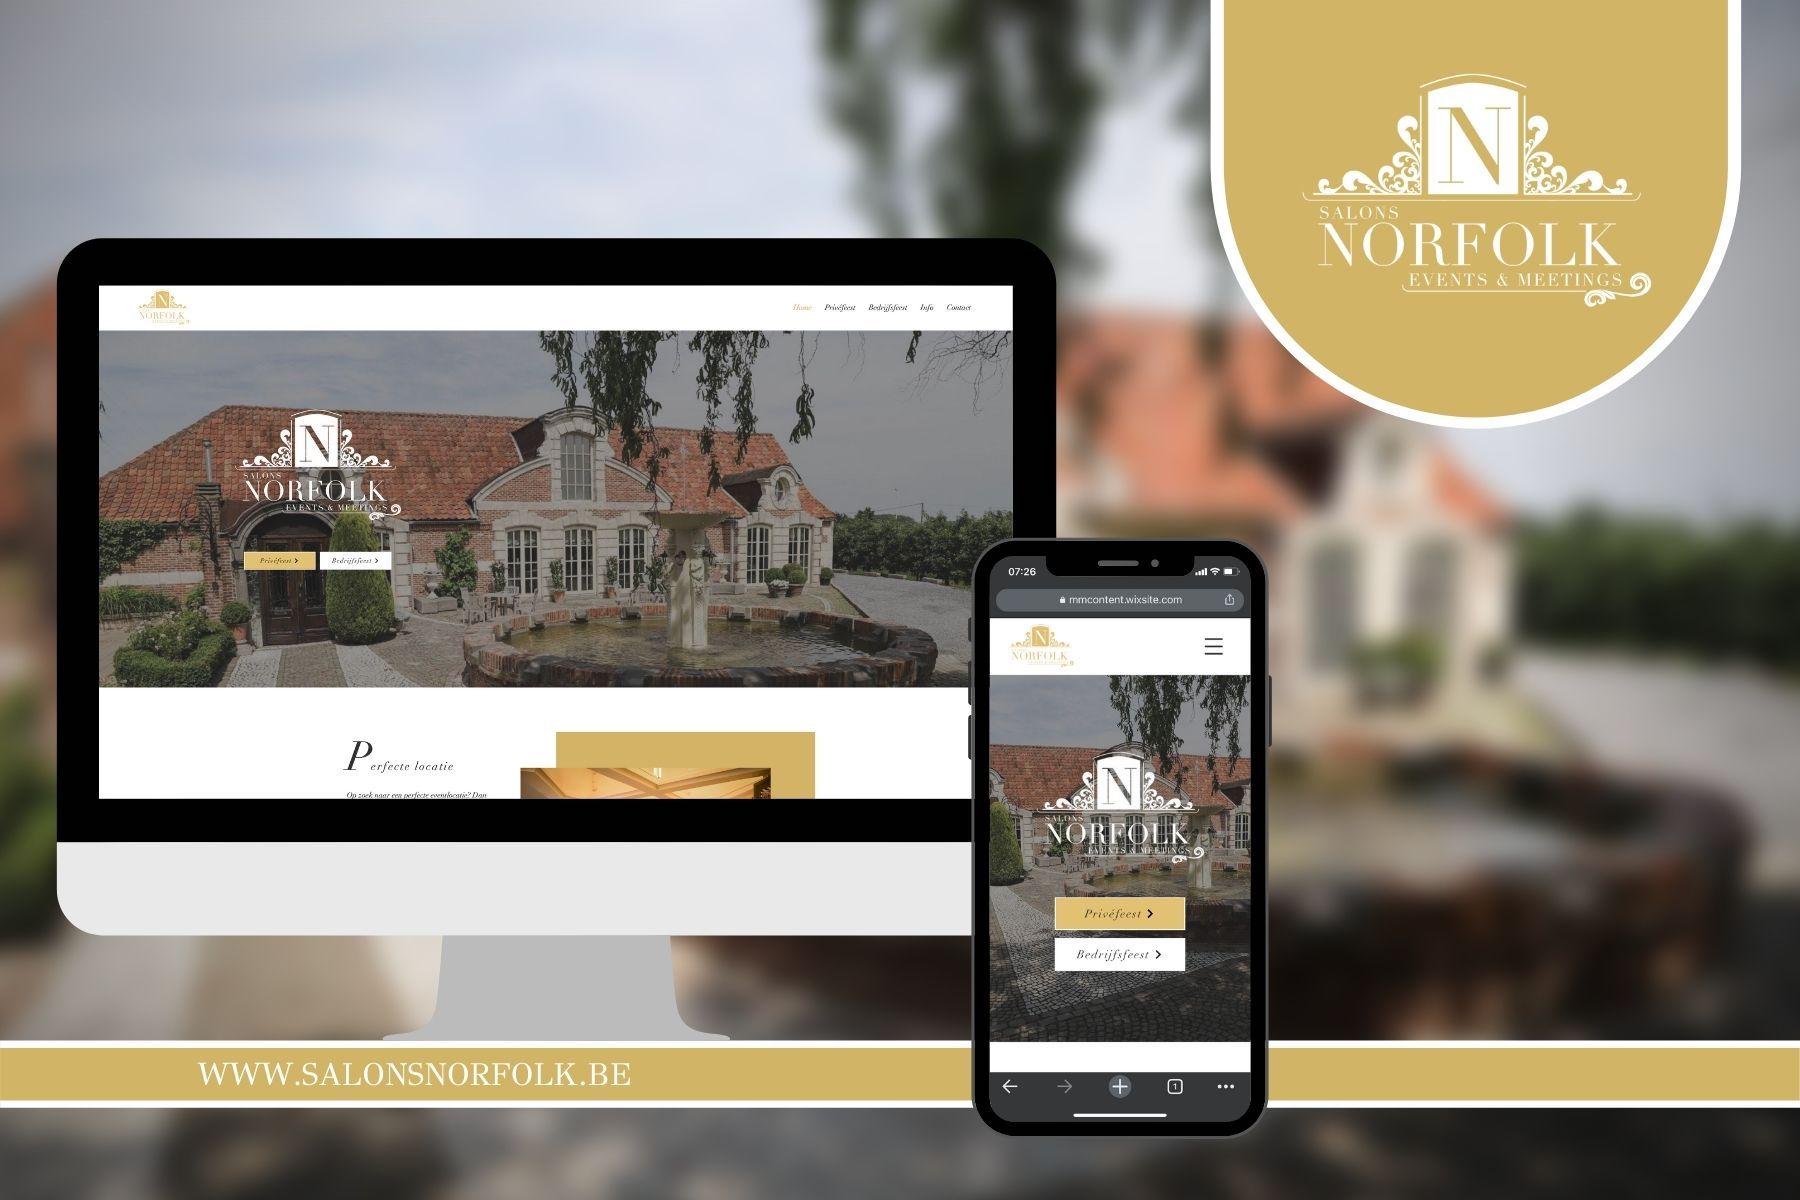 Salons Norfolk ➡️ Webdesign ➡️ SEO ➡️ Mobielvriendelijk ➡️Huissti...